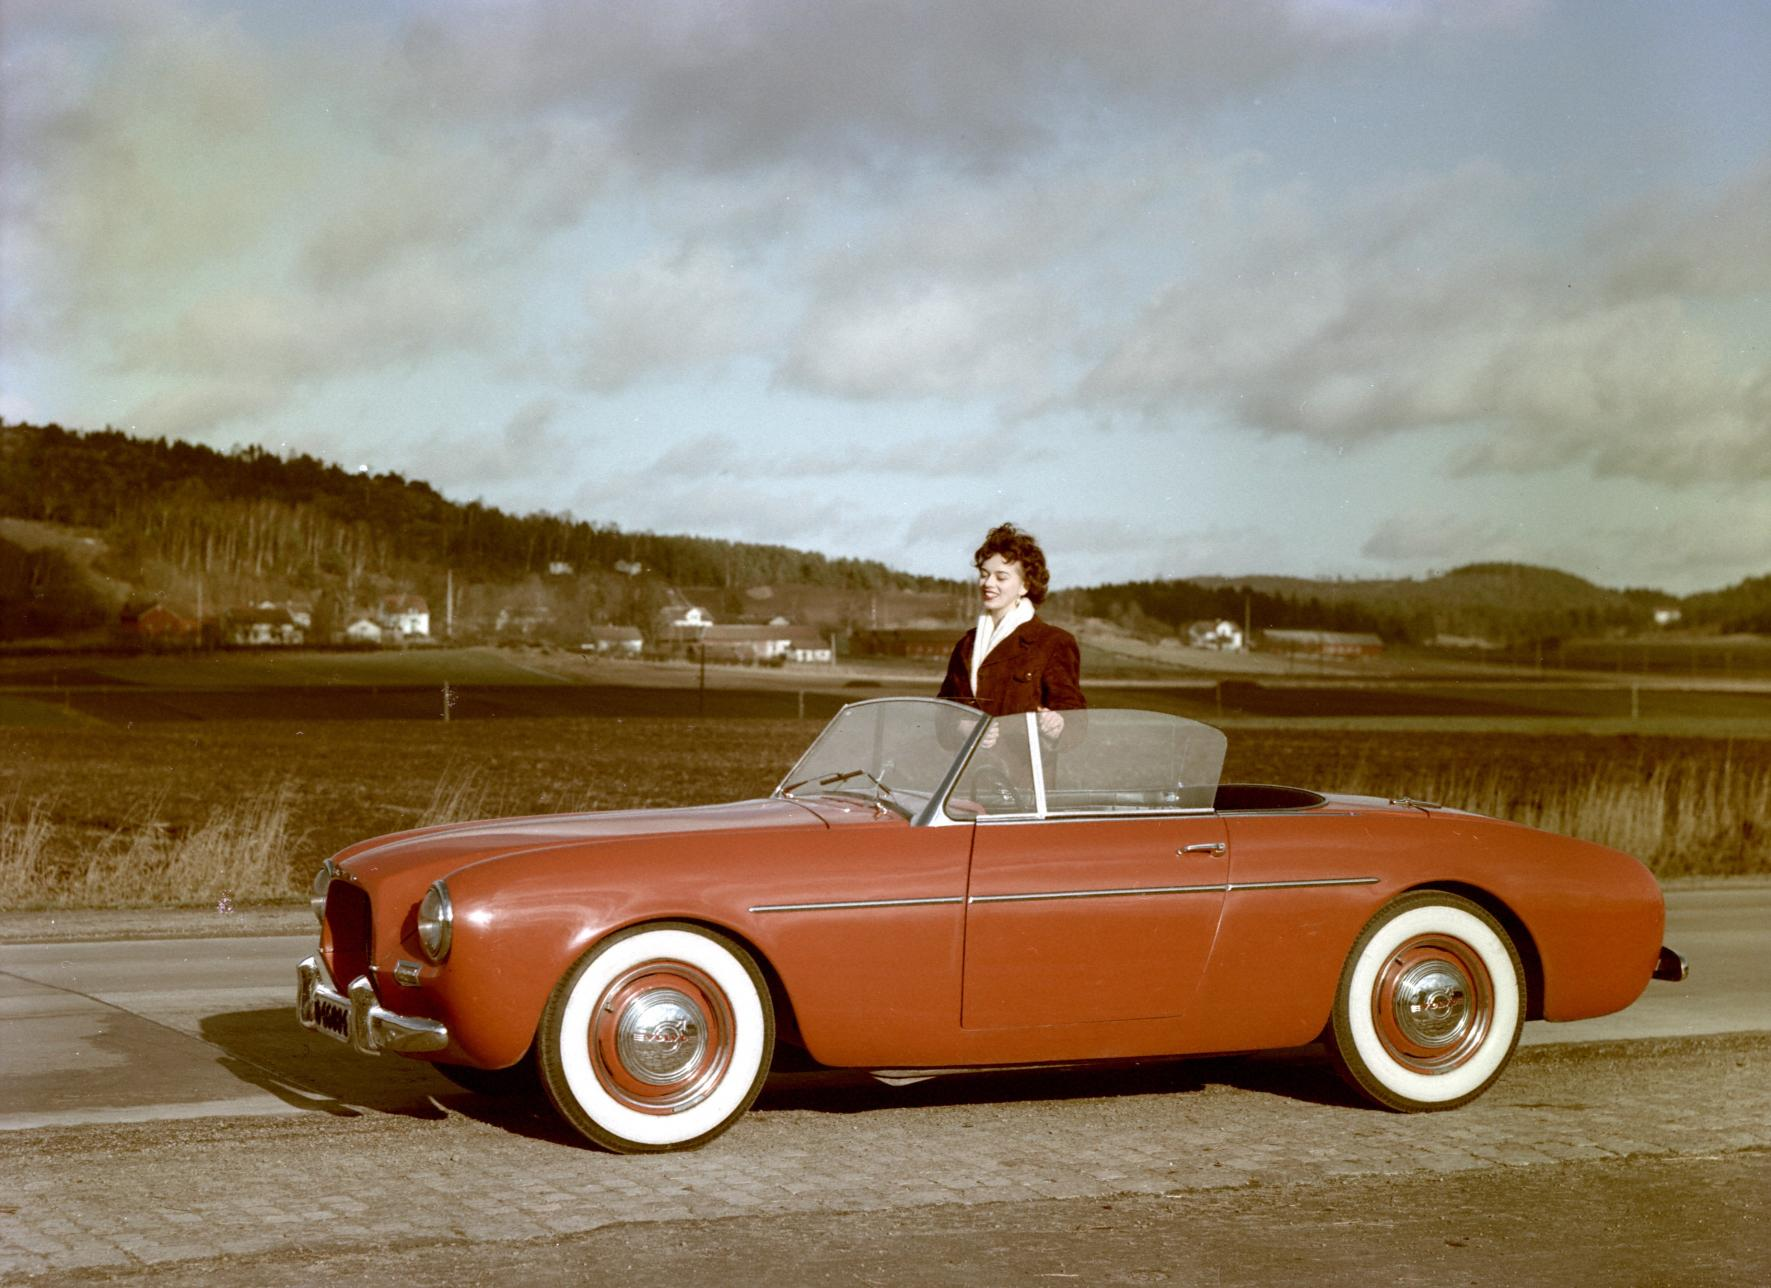 Super Rare Volvo Turns 60: Latest News